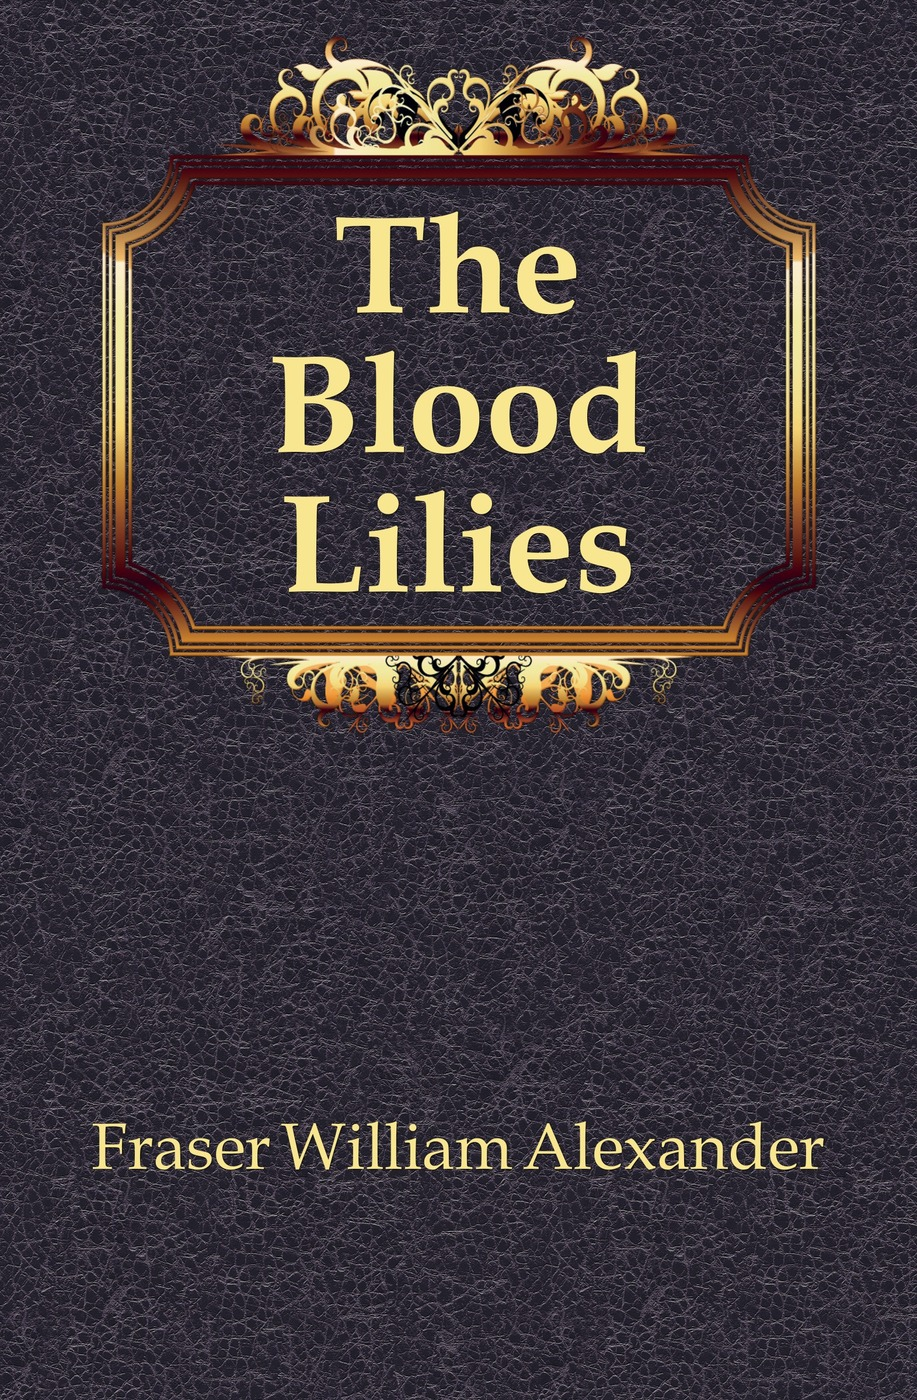 все цены на Fraser William Alexander The Blood Lilies онлайн